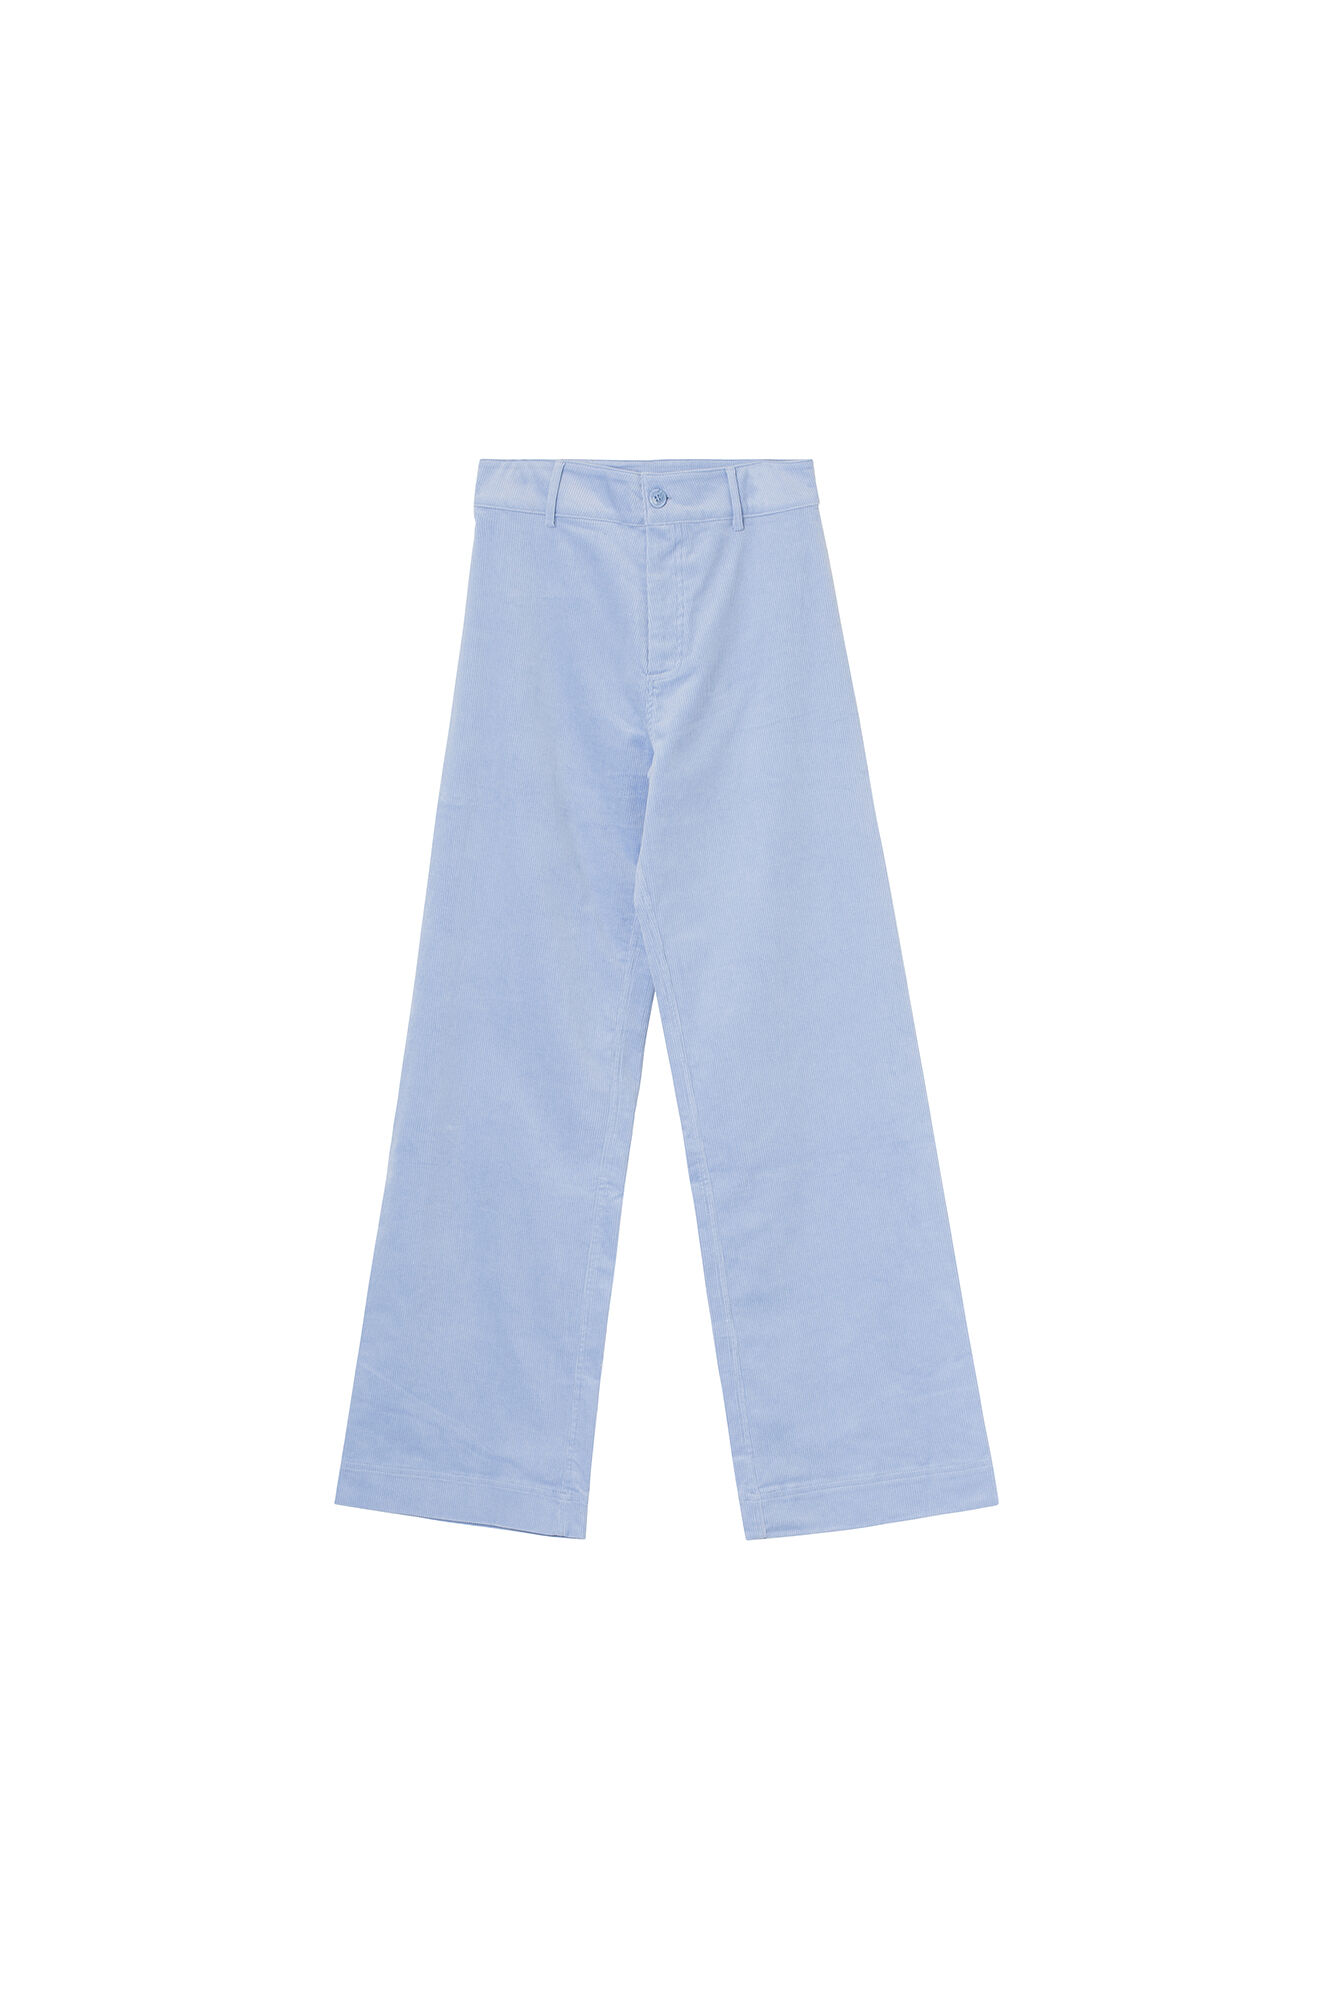 ENOYSTER PANTS 6720